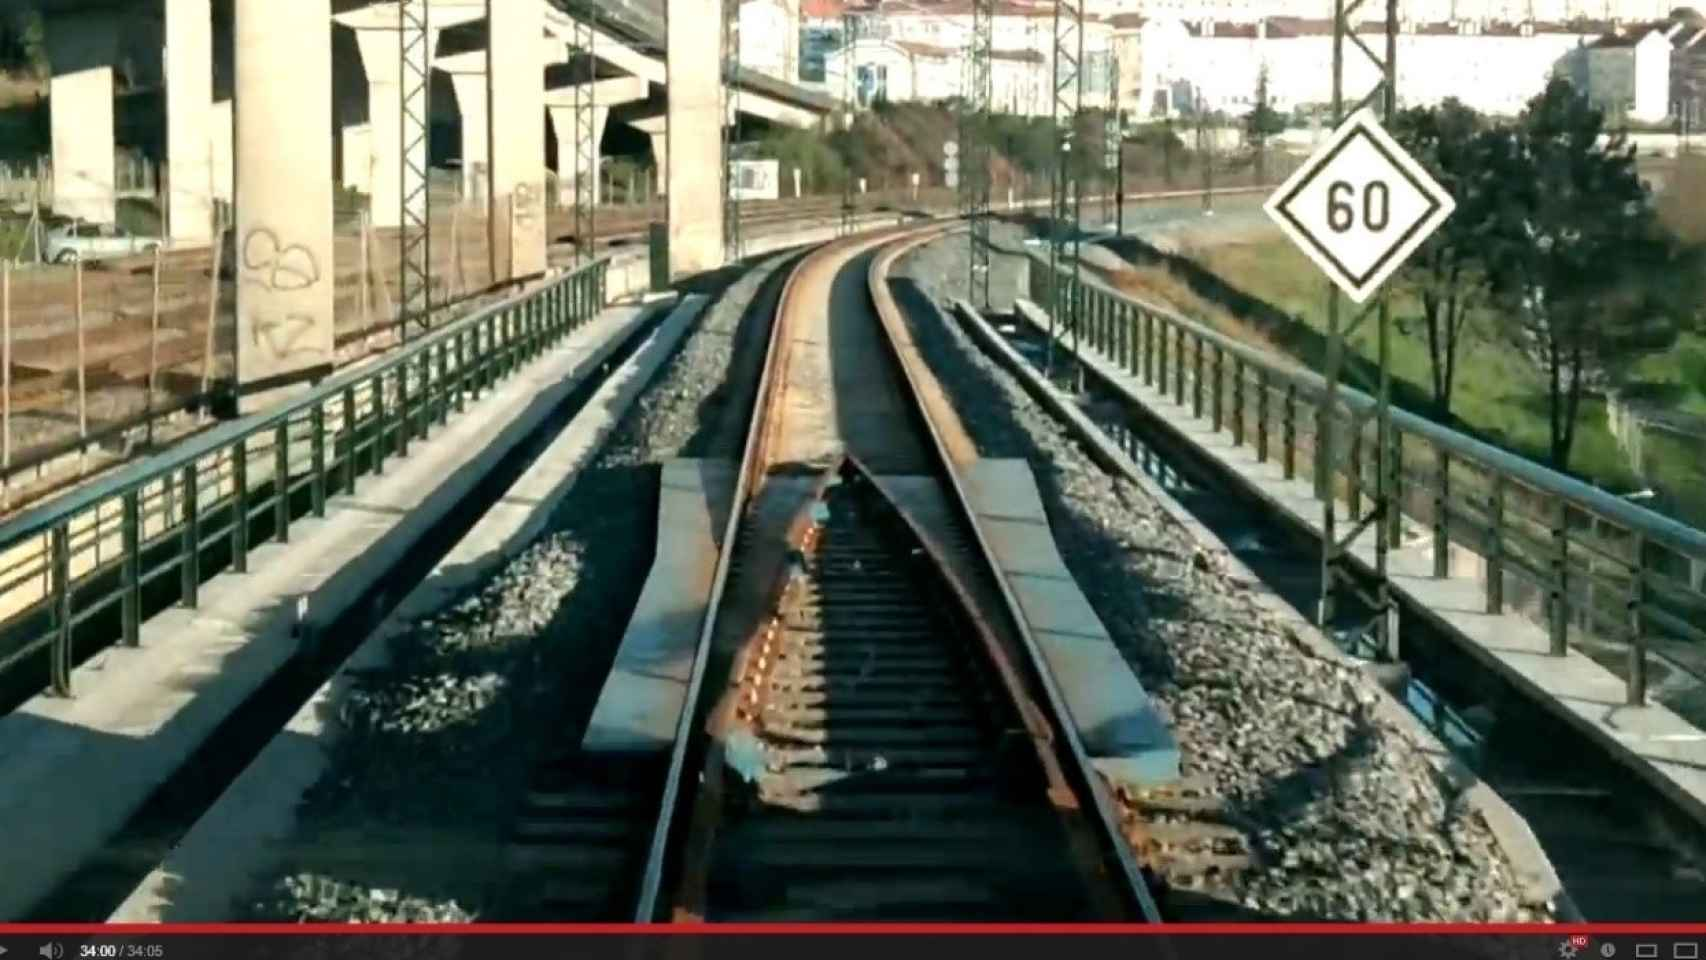 Captura del vídeo del accidente del tren Alvia 730